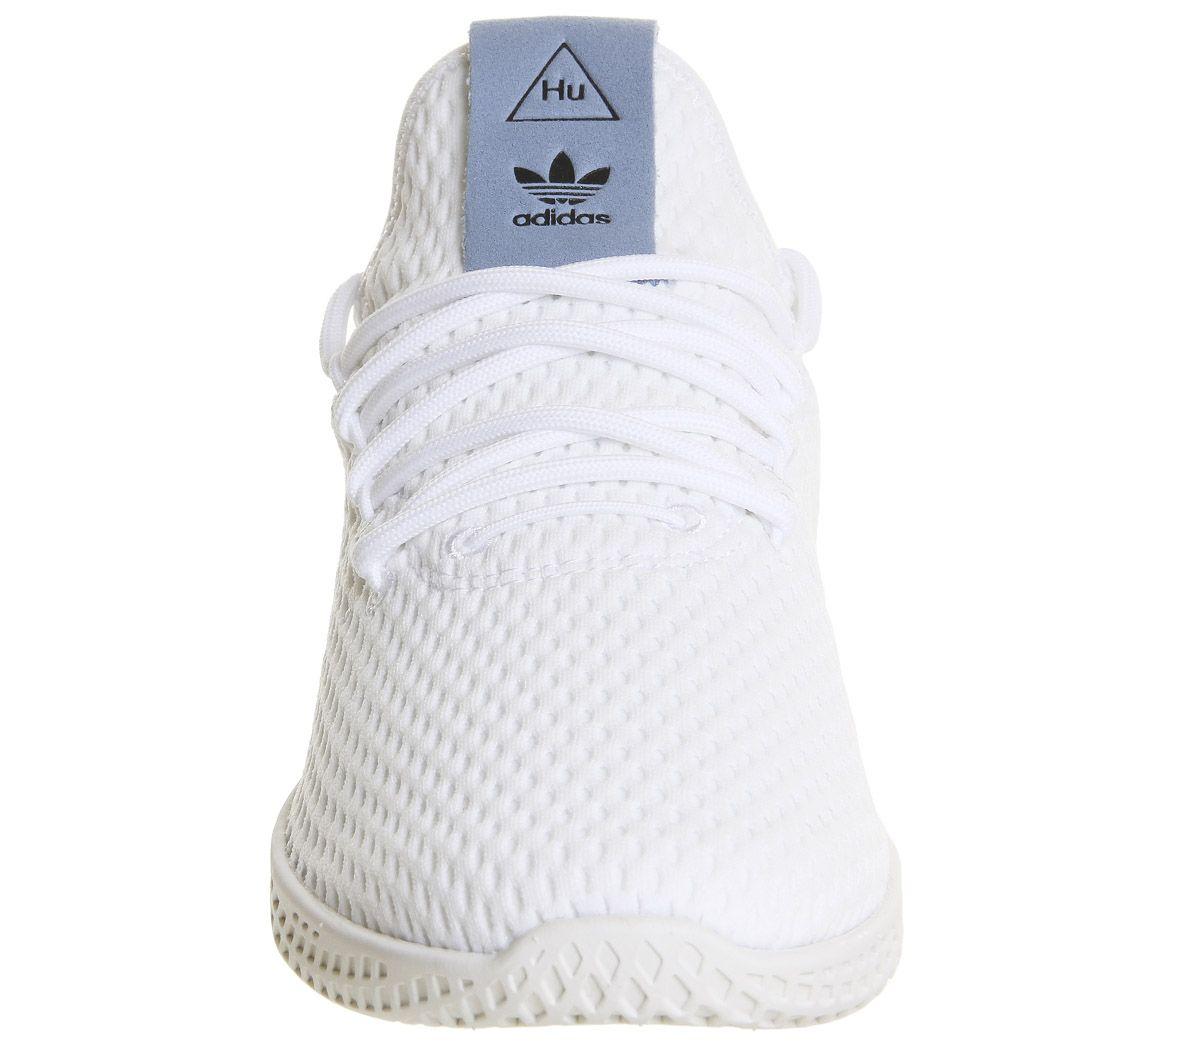 0a8fda98de866 adidas Pw Tennis Hu White Tactile Blue - Hers trainers